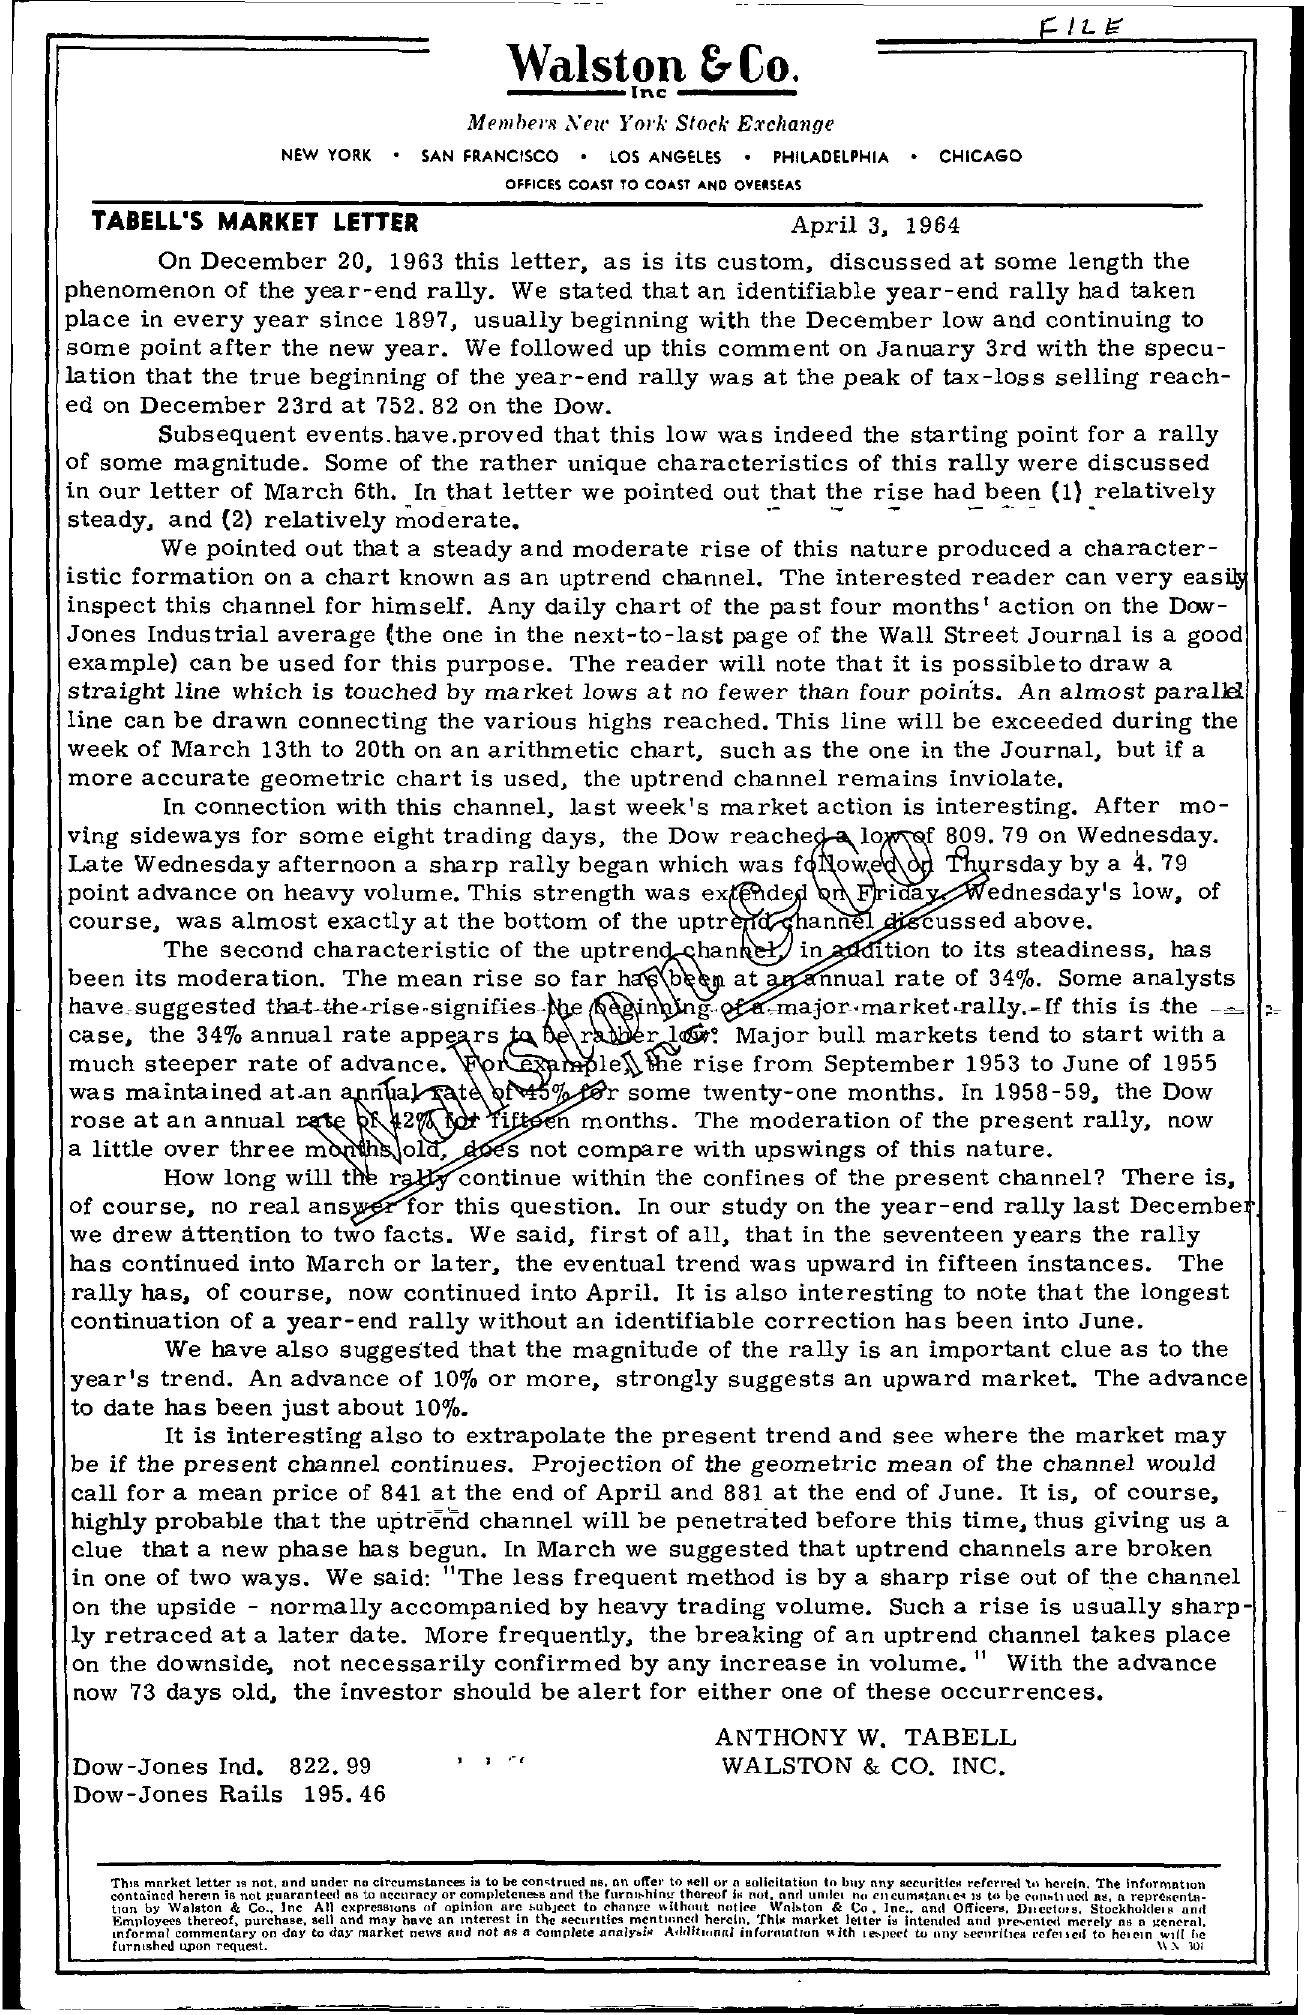 Tabell's Market Letter - April 03, 1964